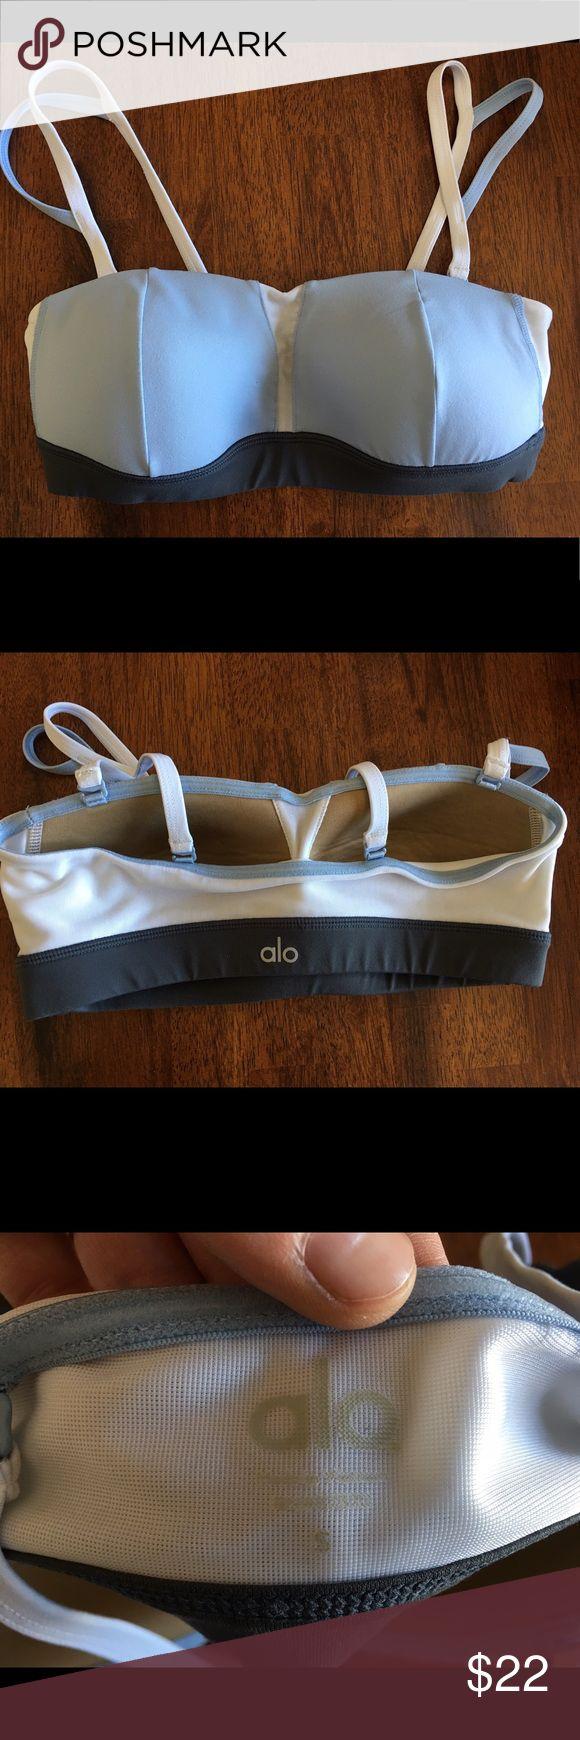 ALO Yoga women's sports bra size s VEUC Excellent condition. Has padding. ALO Yoga Intimates & Sleepwear Bras